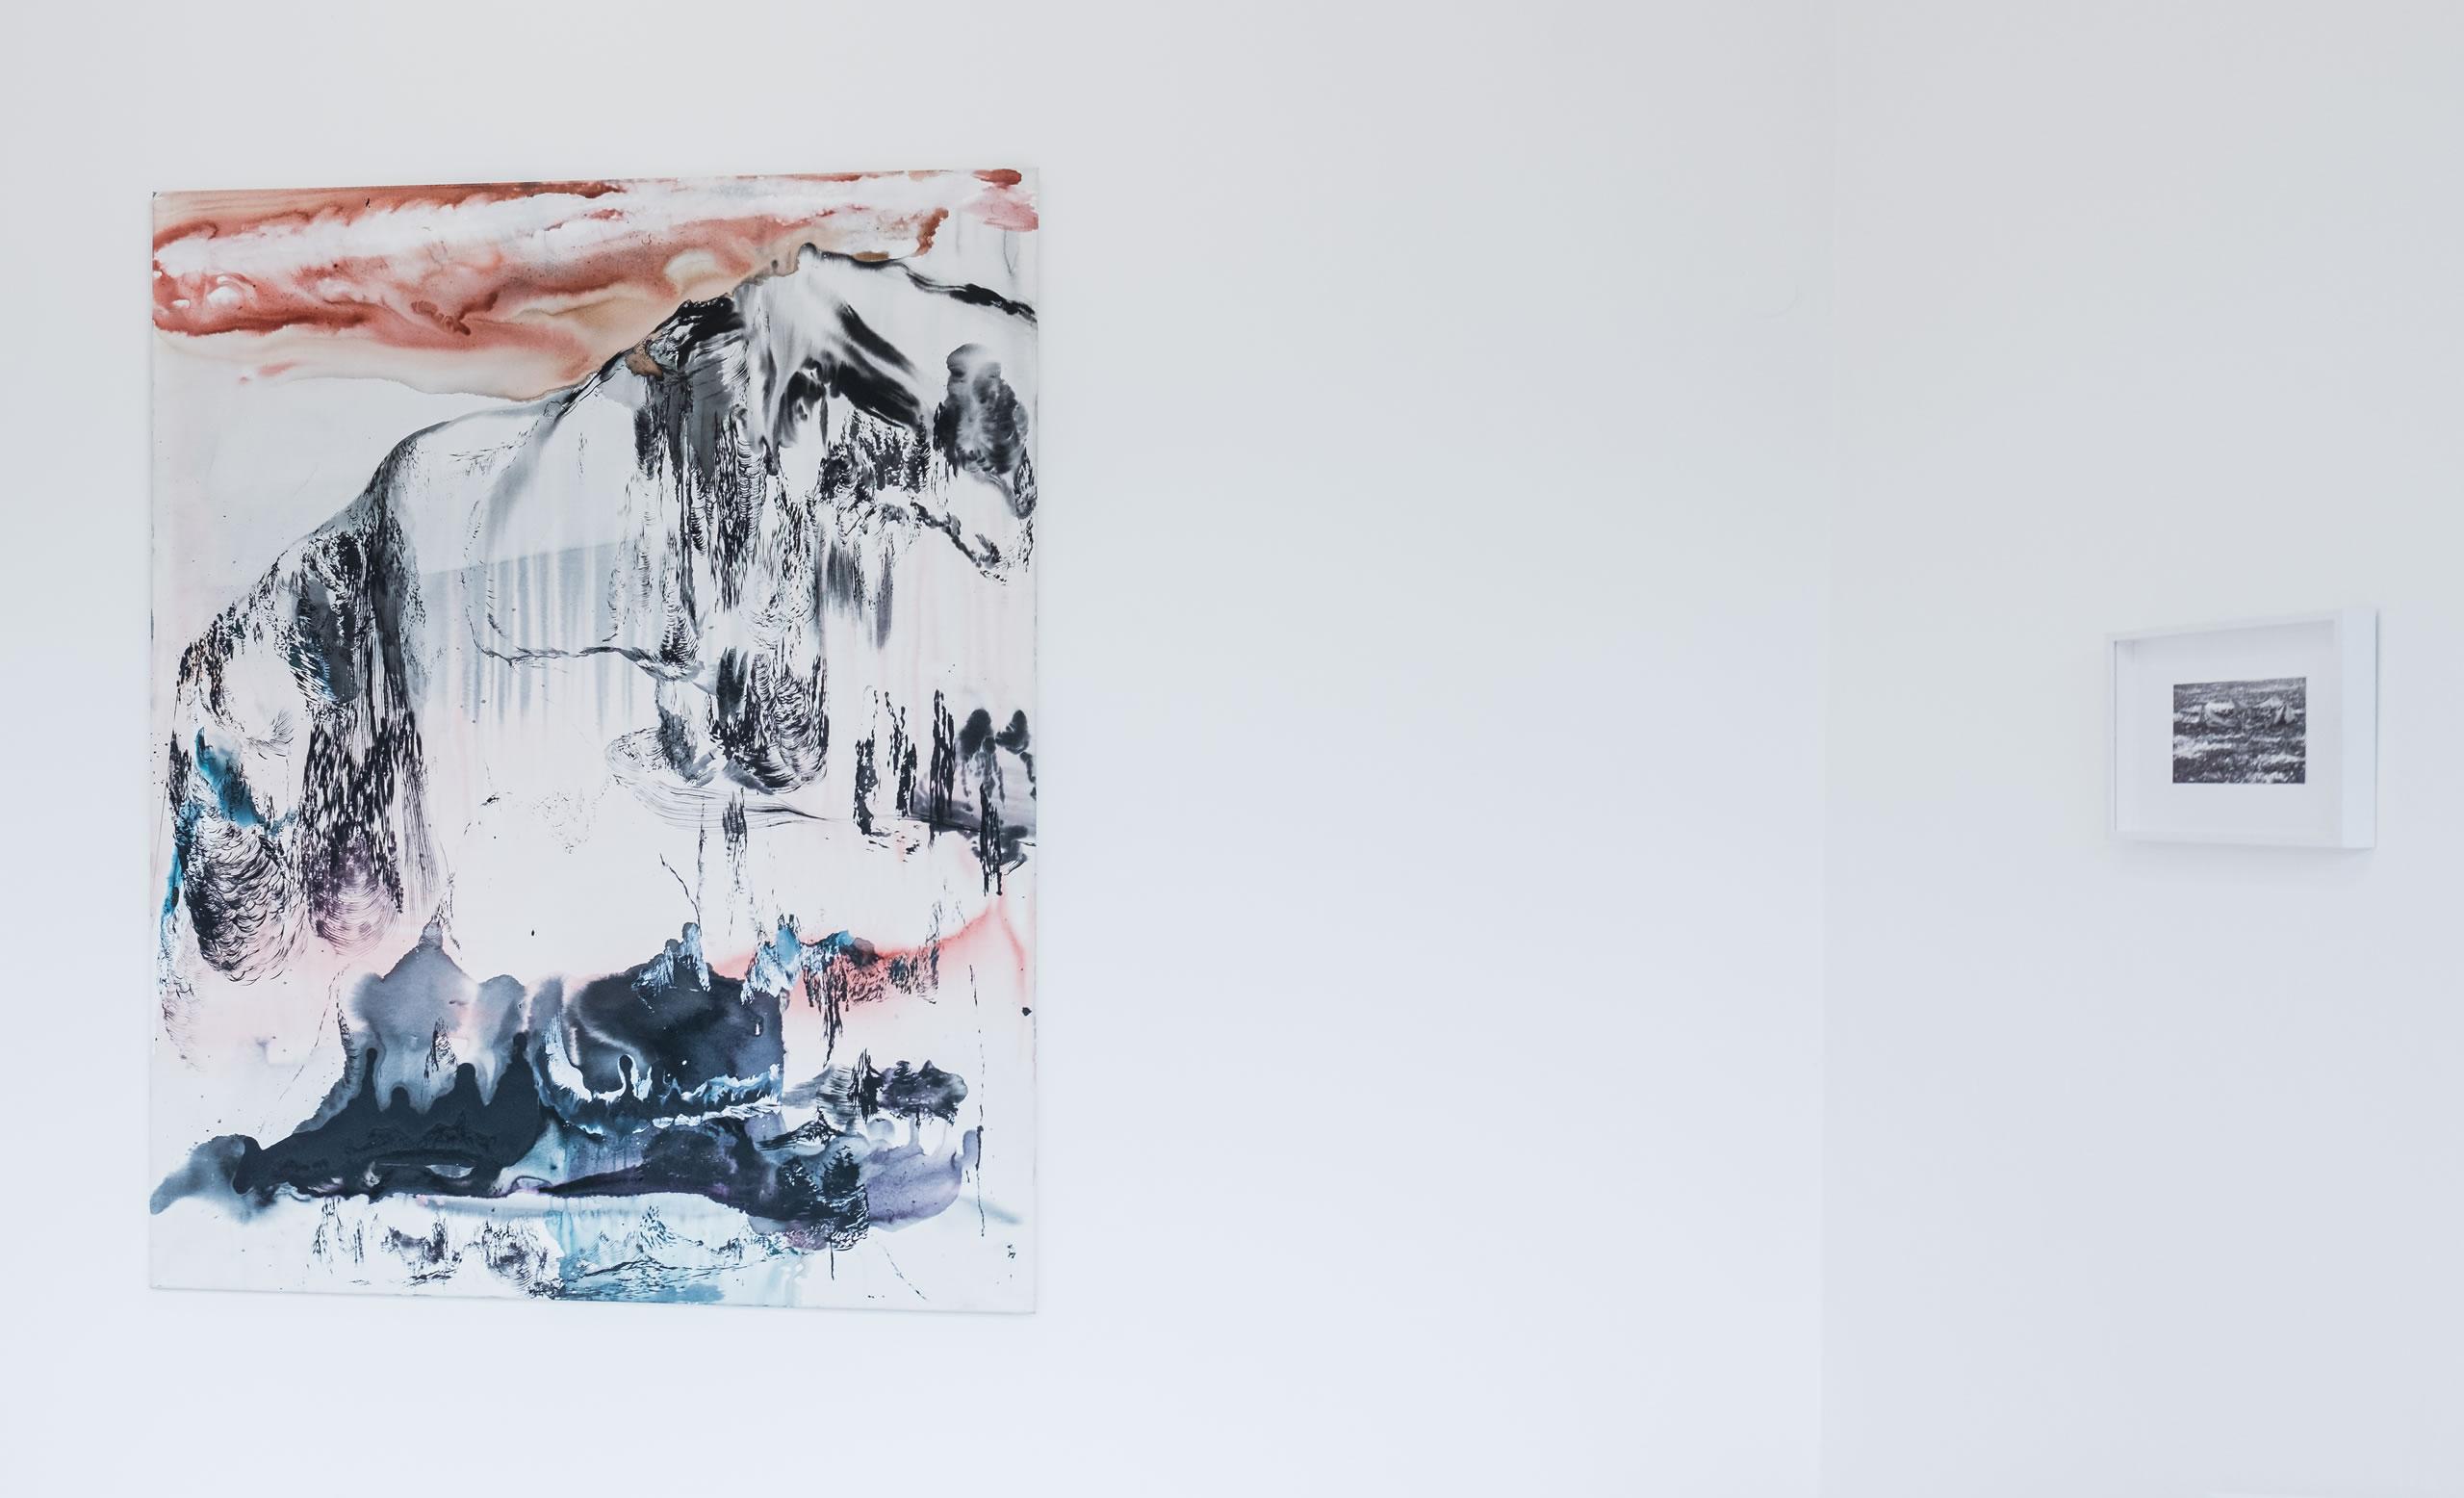 3. Törn | Veronika Dirnhofer | Margot Pilz | Foto Manu Lasnik | 2019 | Galerie3